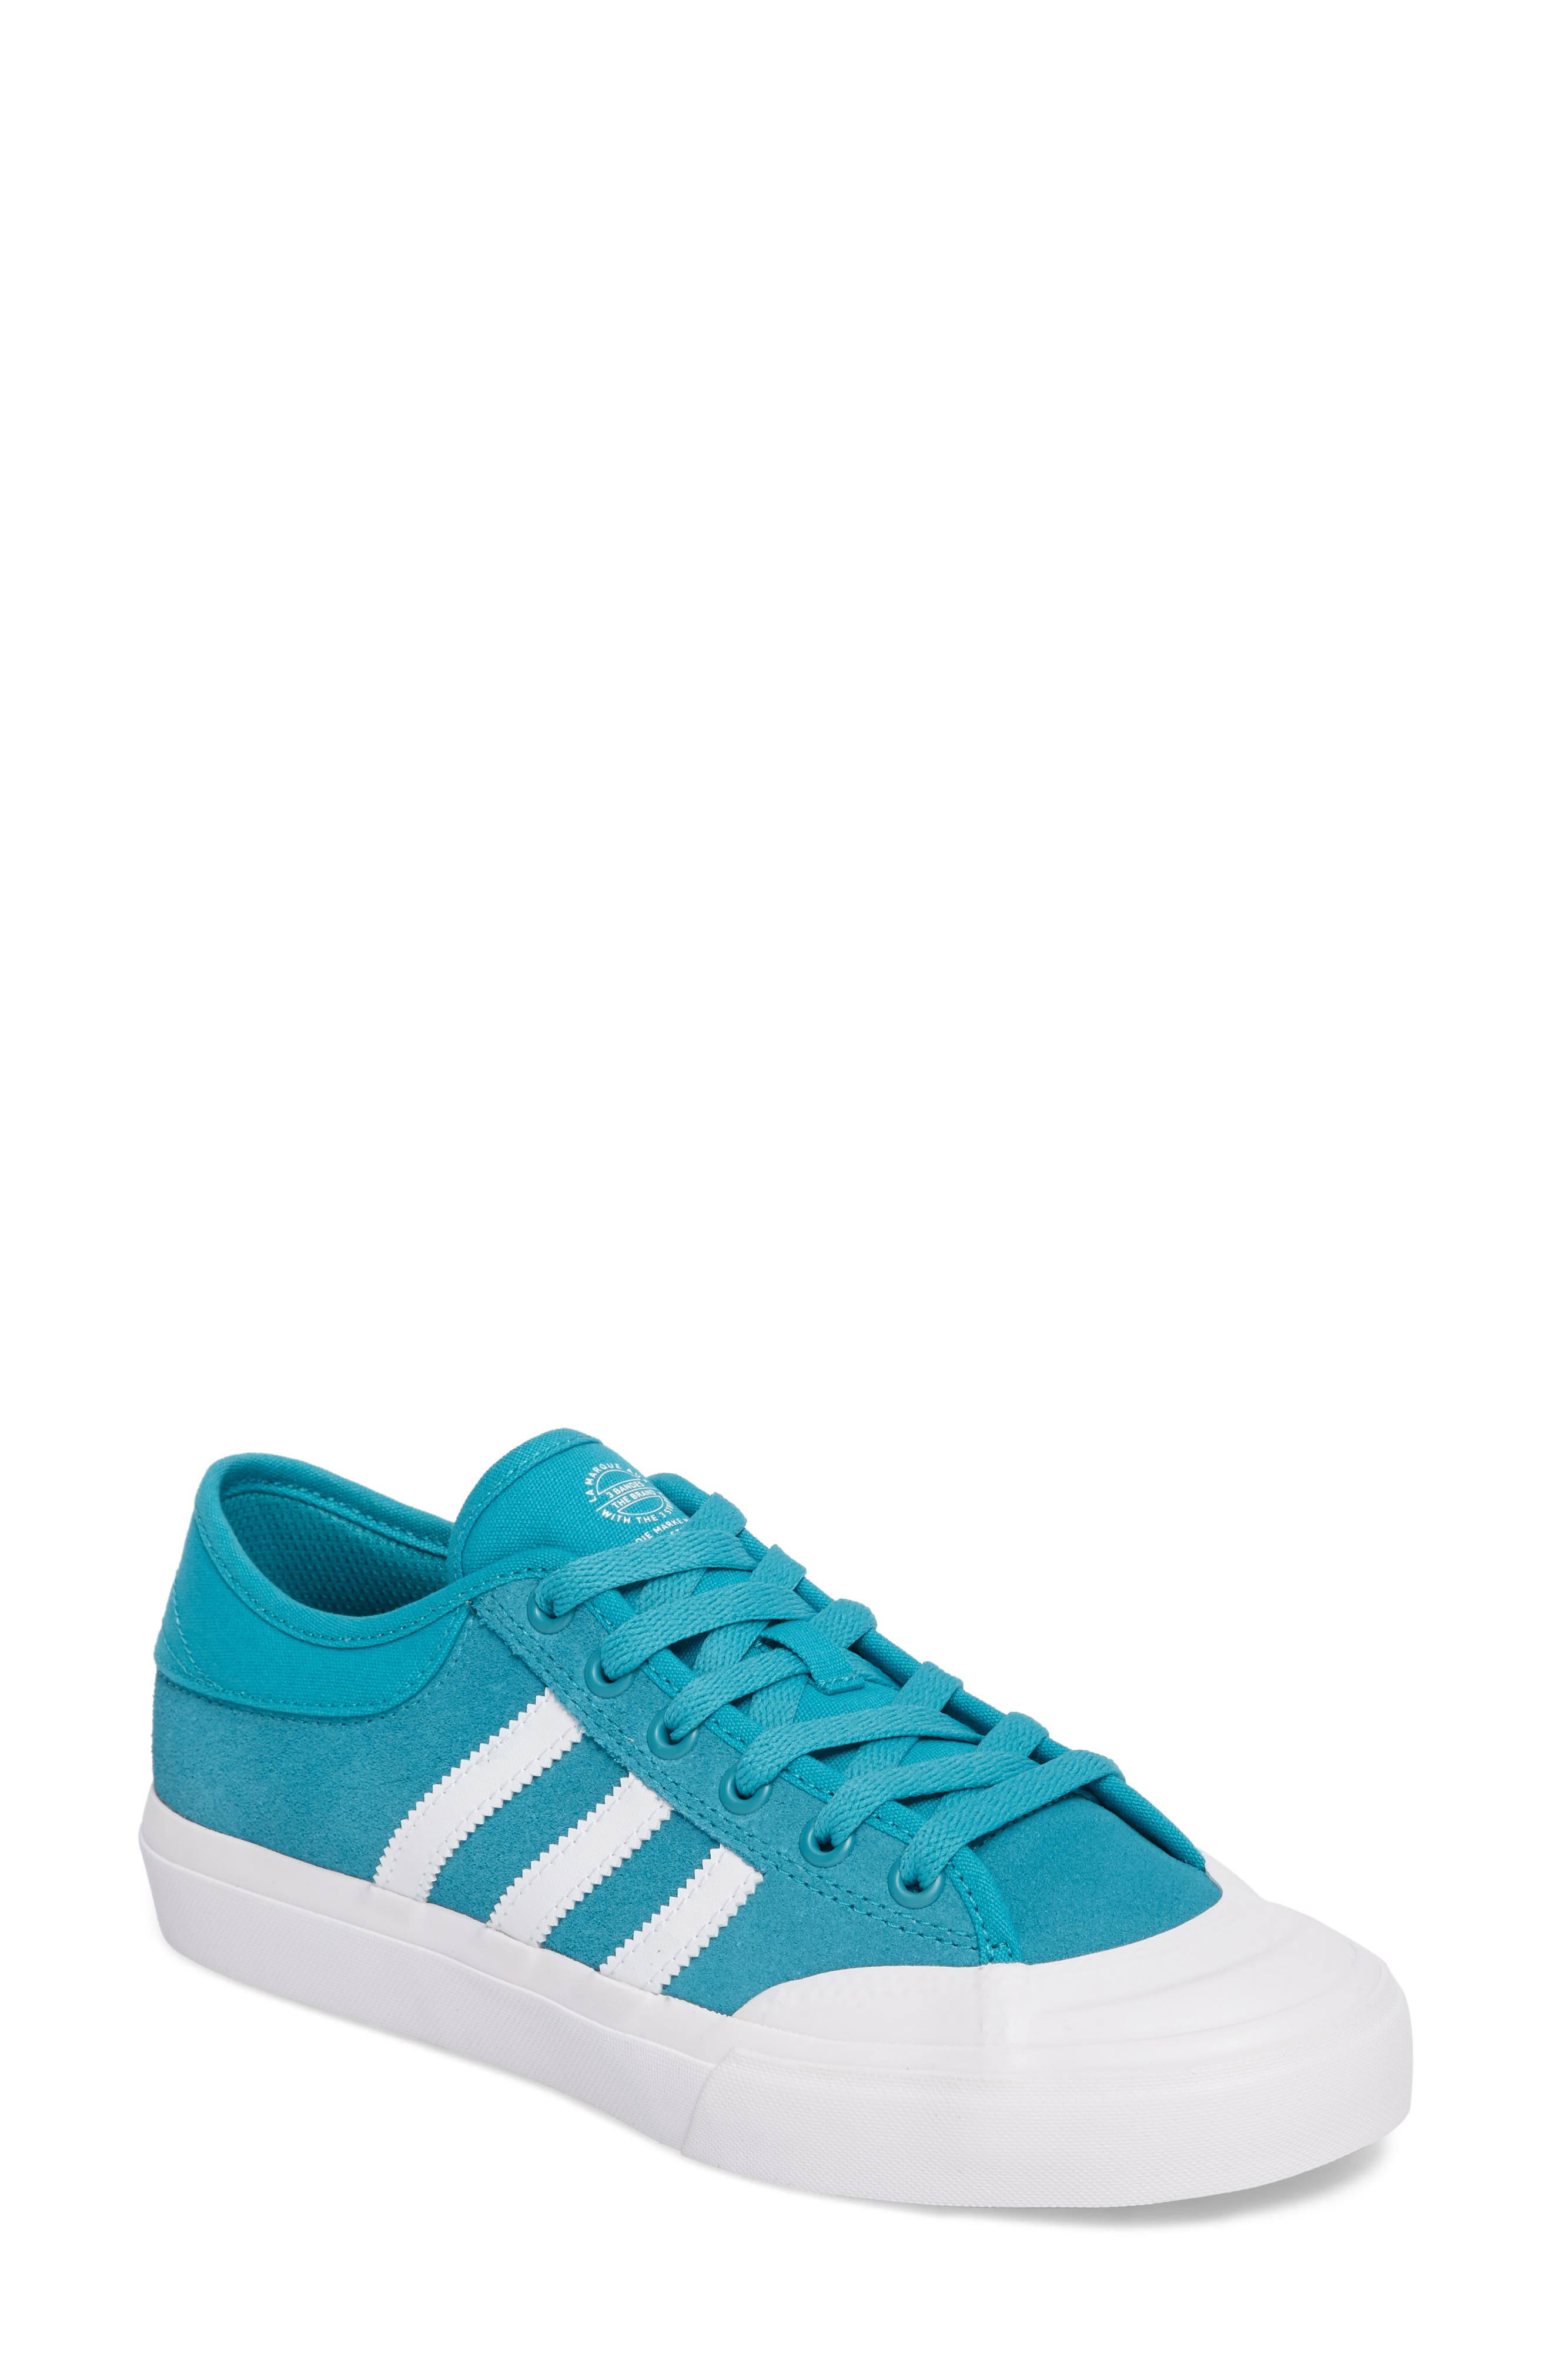 ADIDAS Matchcourt Mid High Sneaker, Main, color, 400